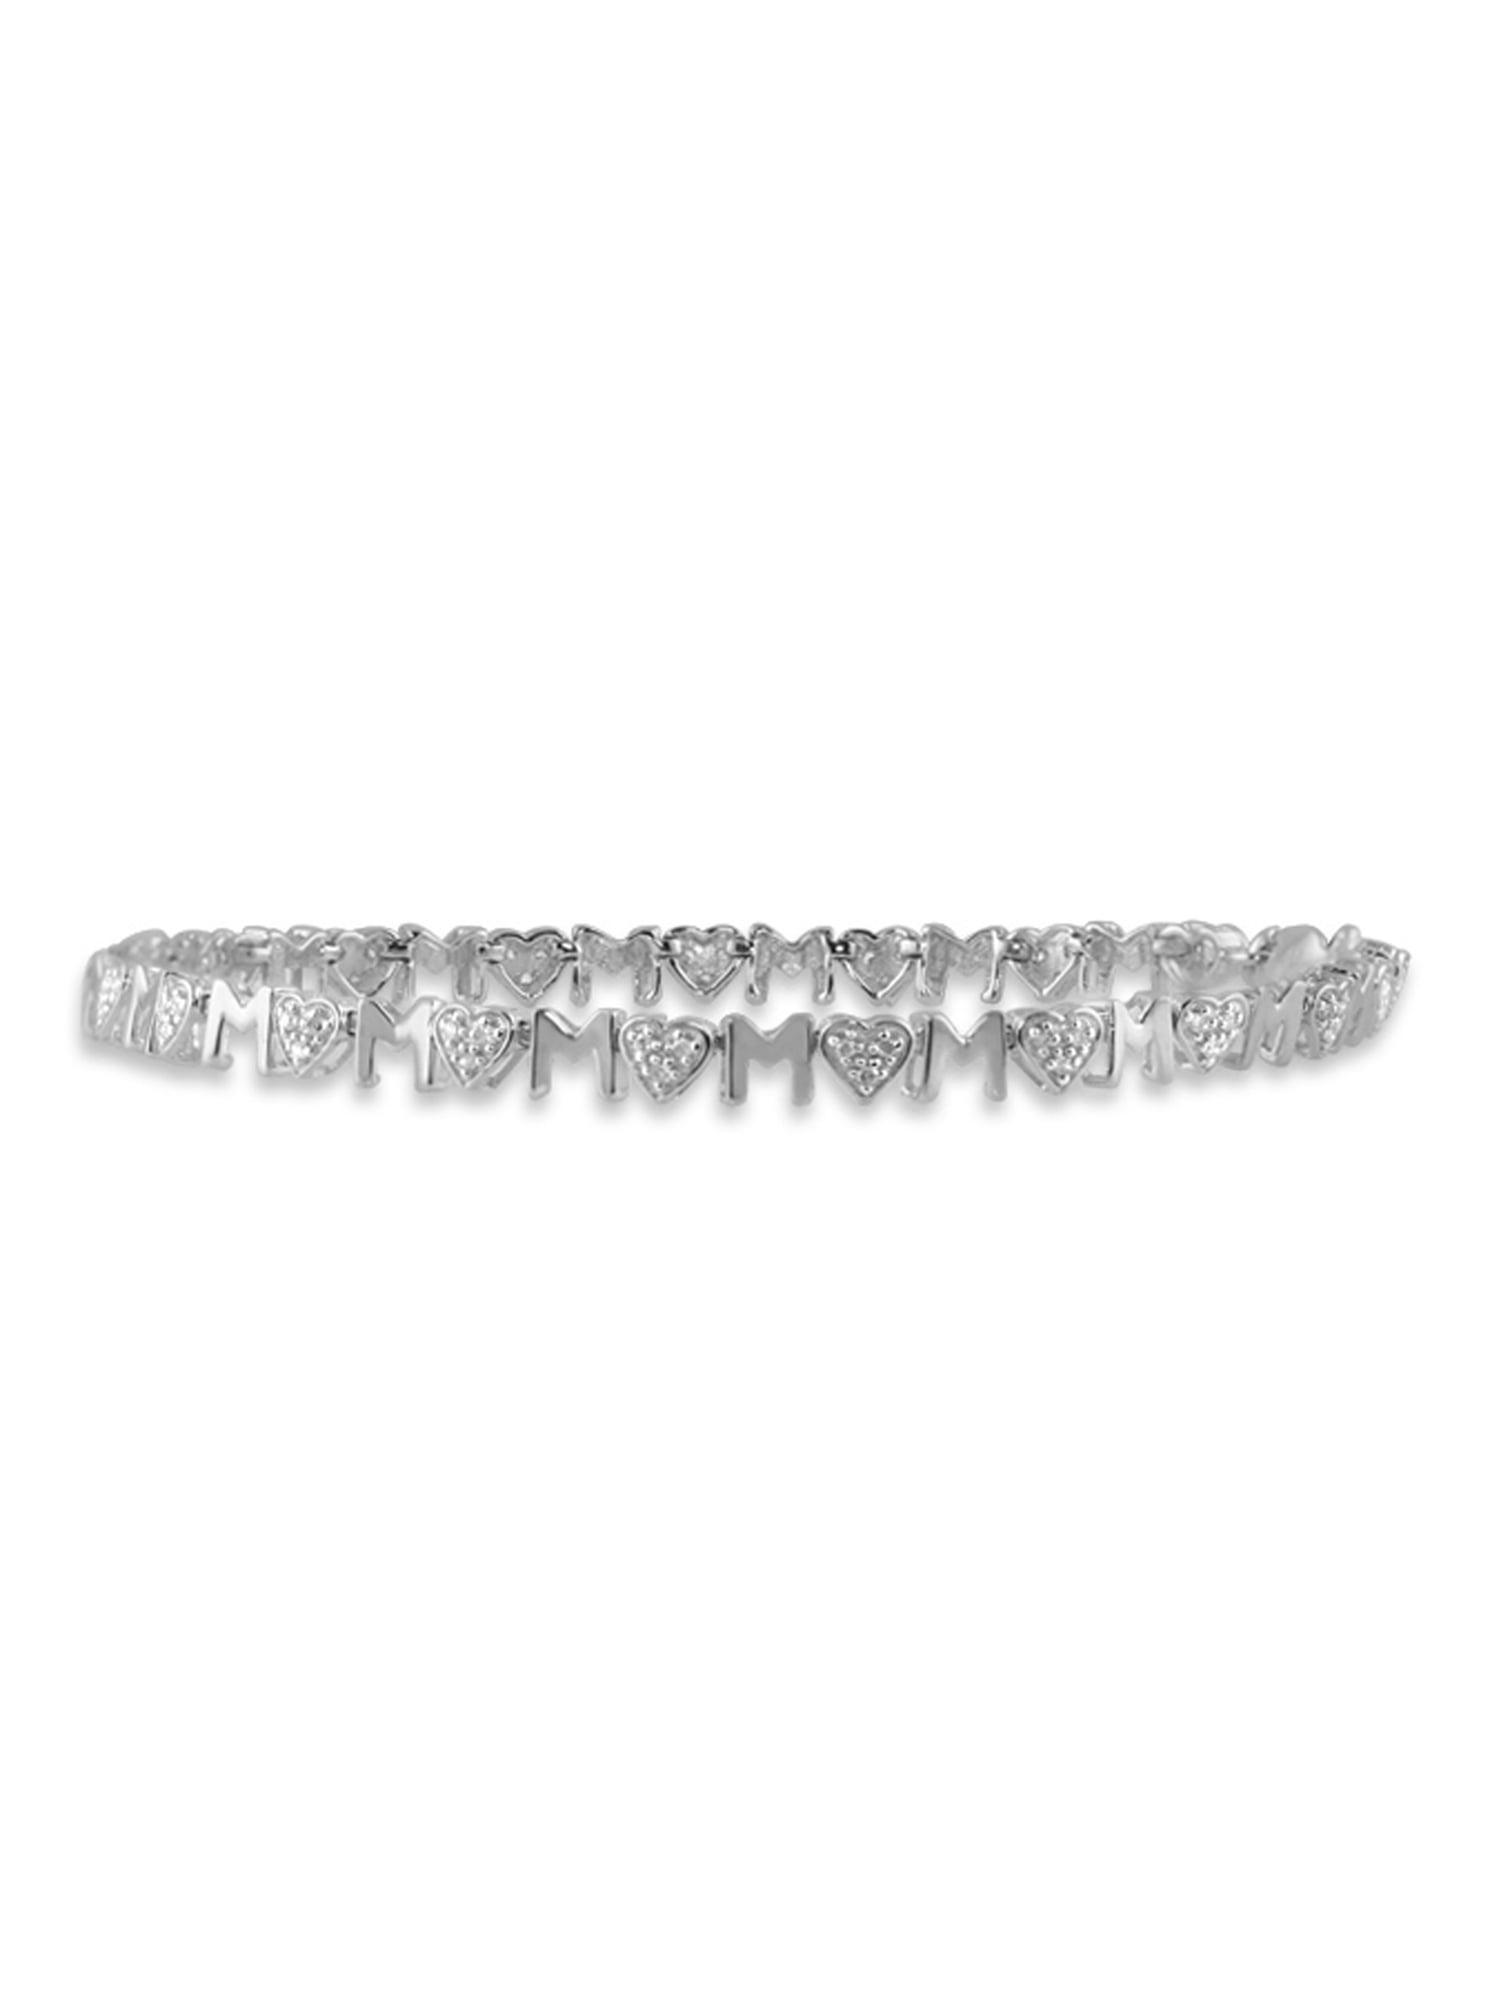 JewelersClub 1 5 Carat T.W. White Diamond Sterling Silver Mother Bracelet by JewelersClub